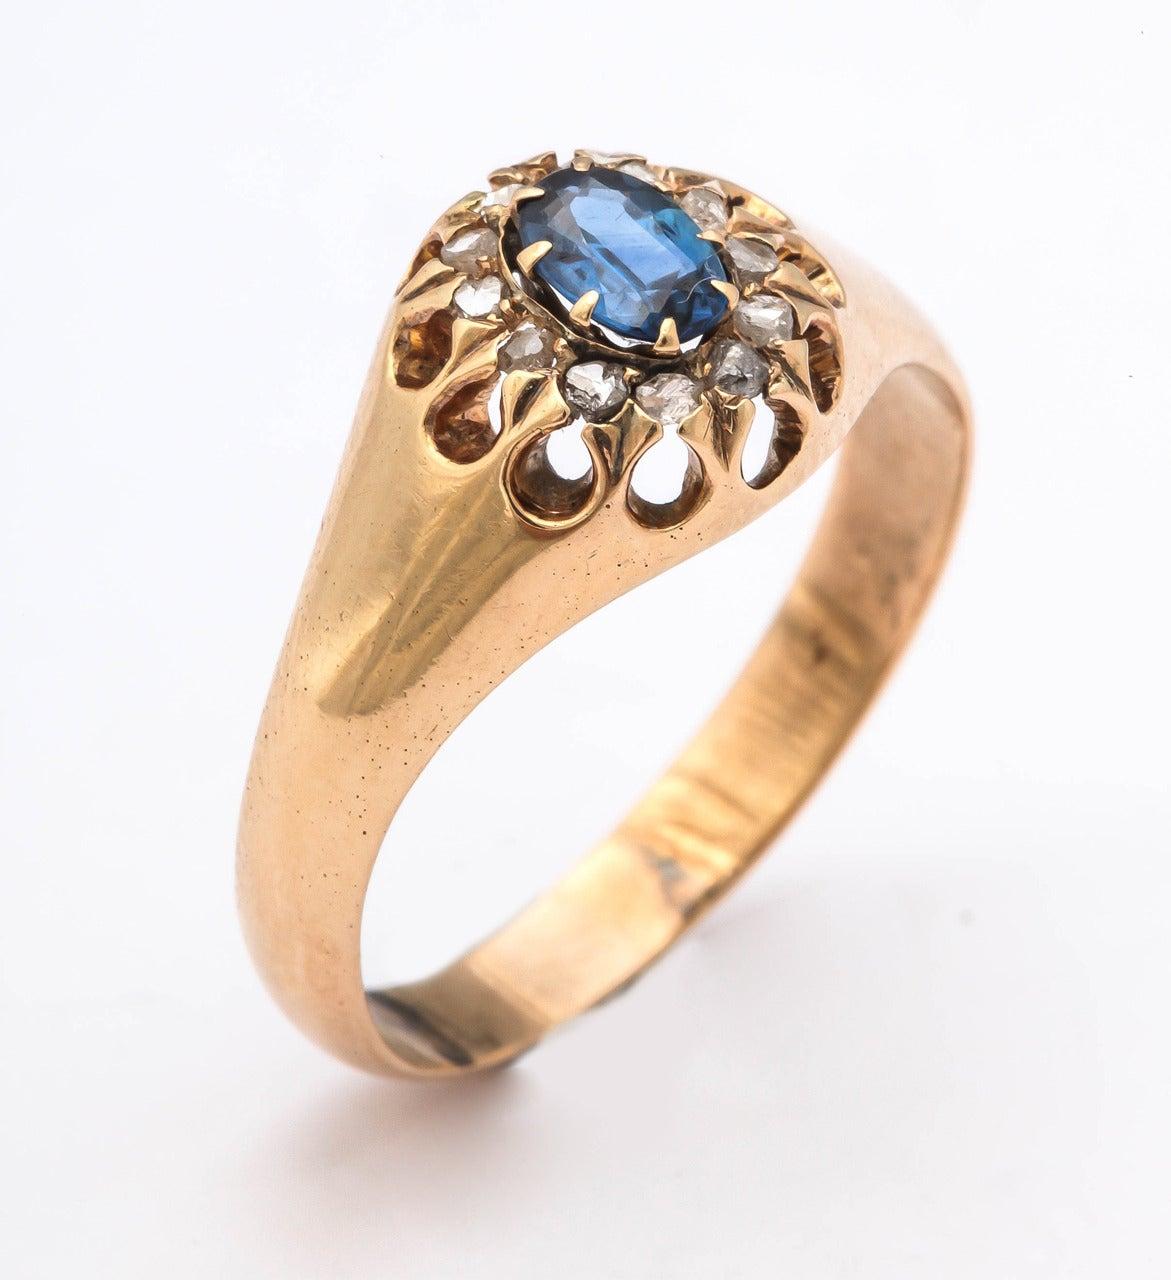 1917 Russian Revolution Sapphire Diamond Gold Cluster Ring 10